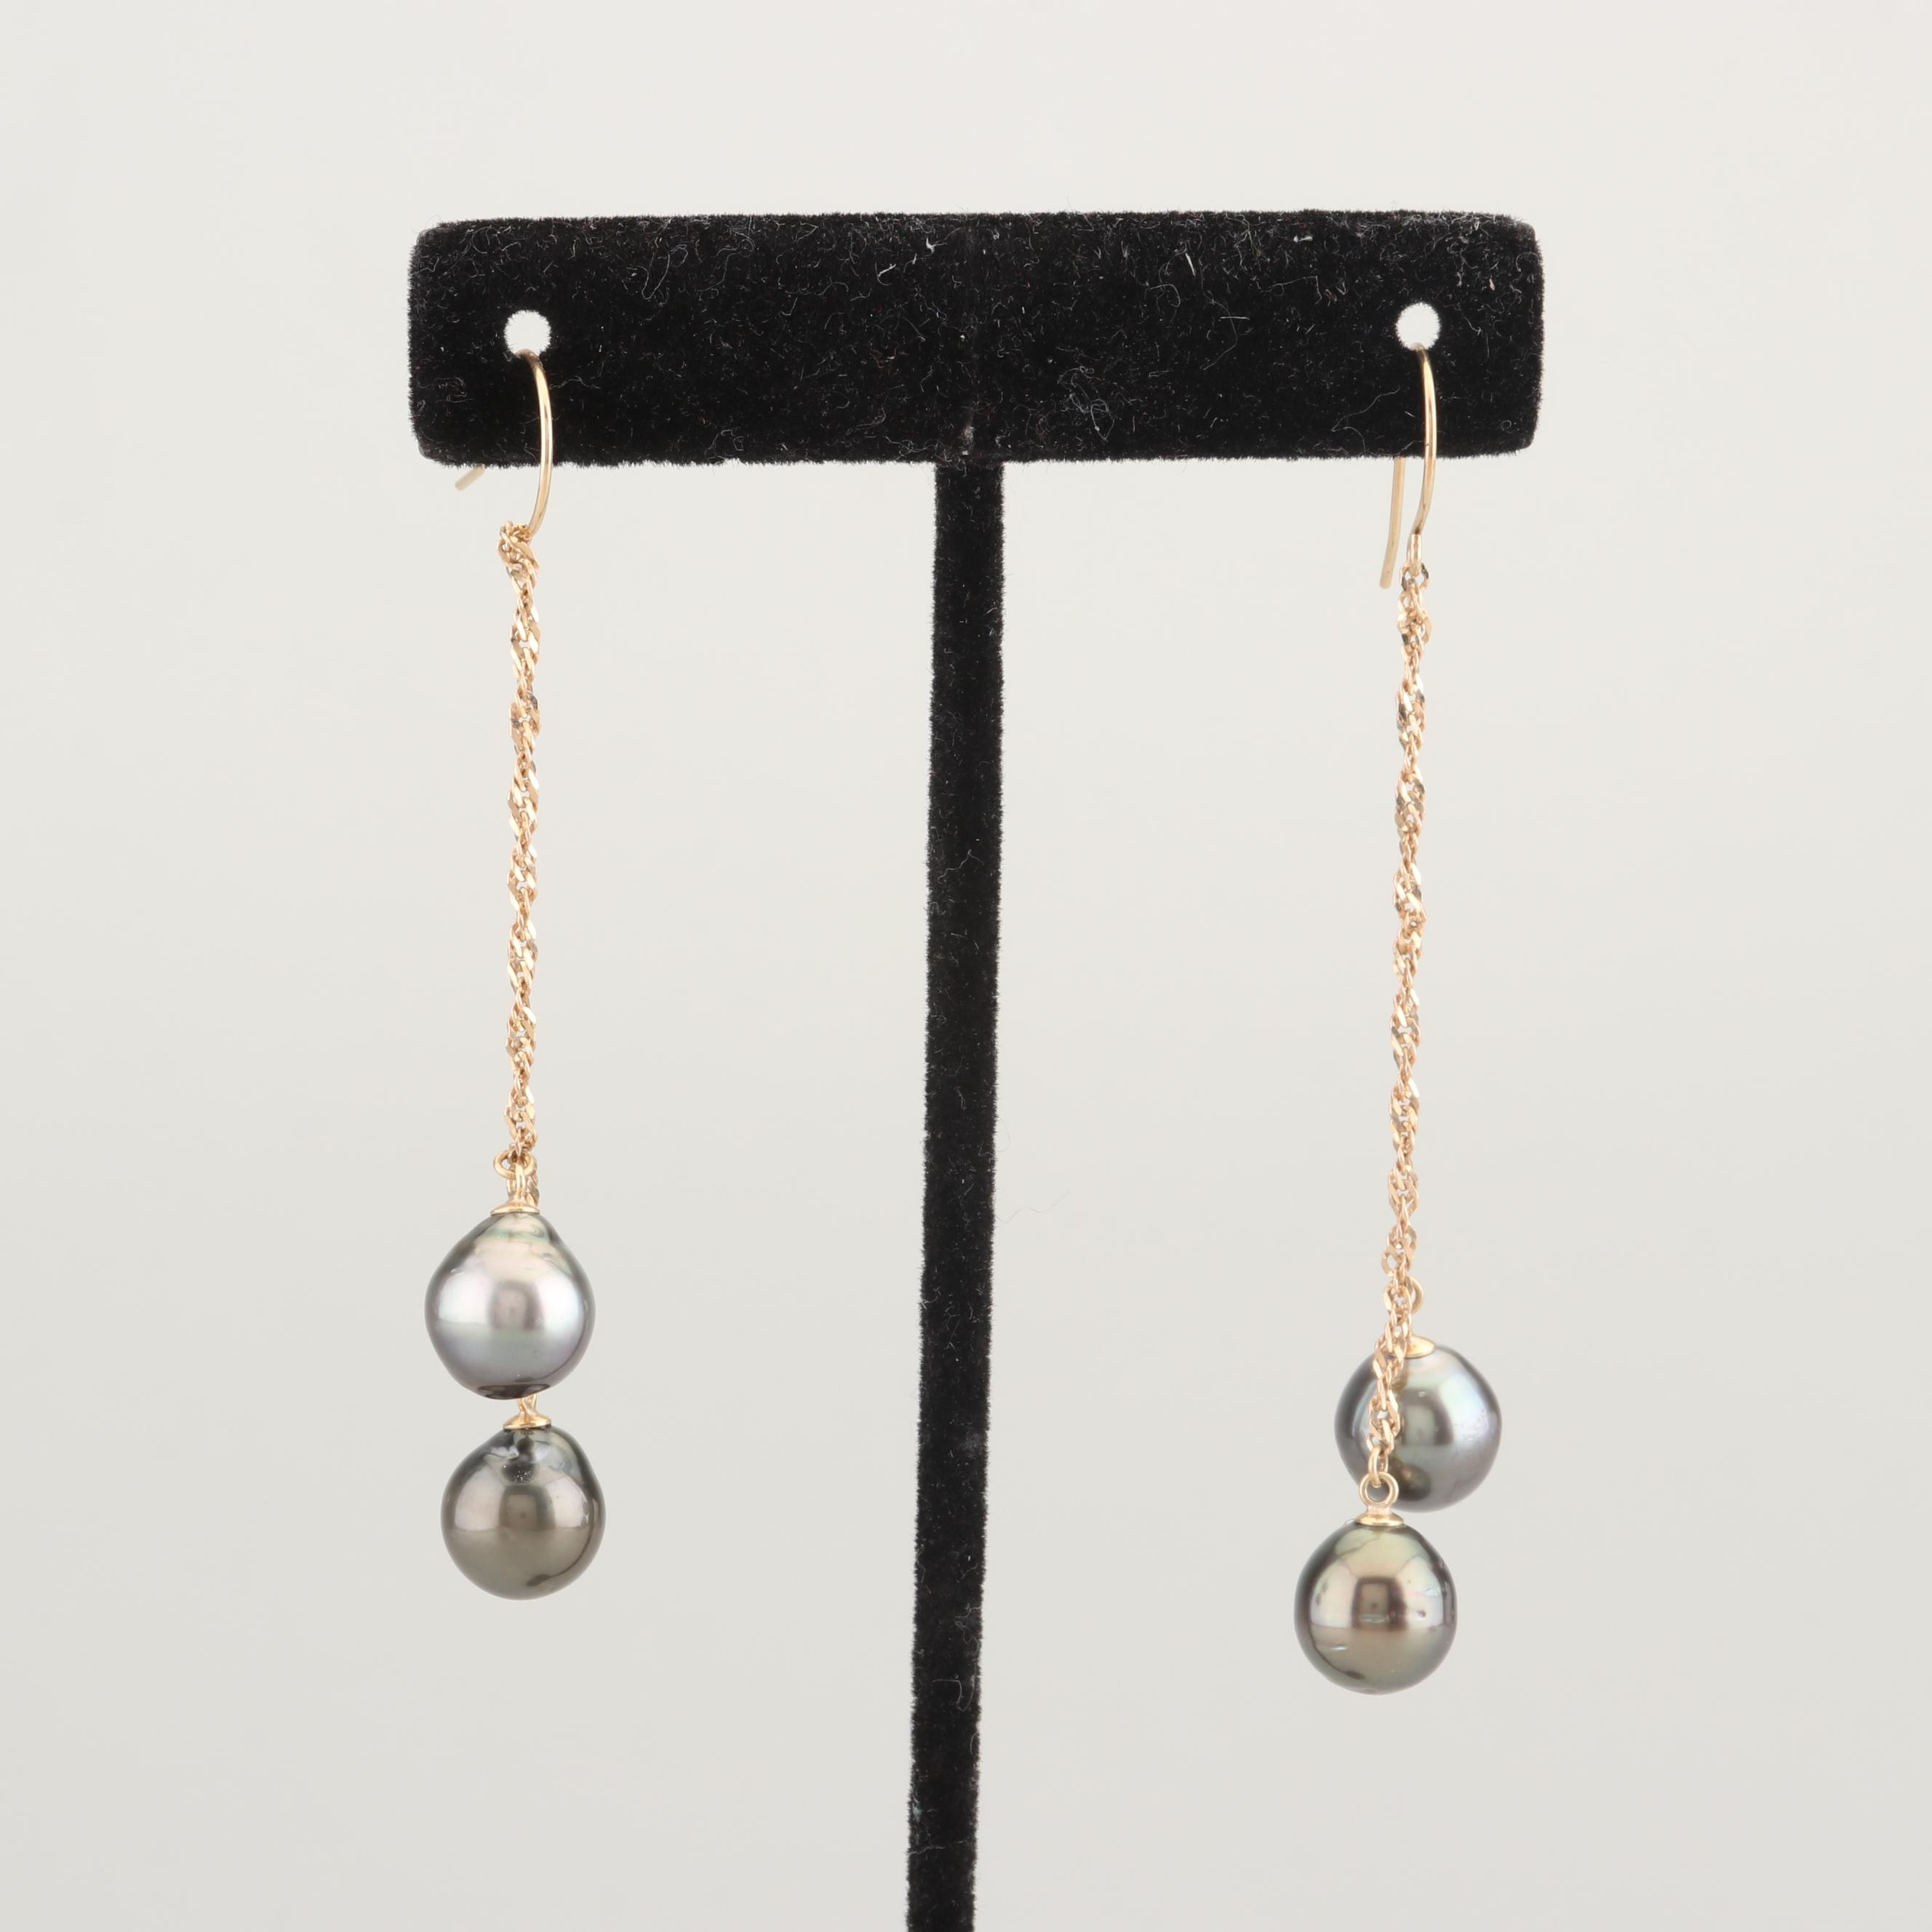 14K Yellow Gold Black Pearl Earrings